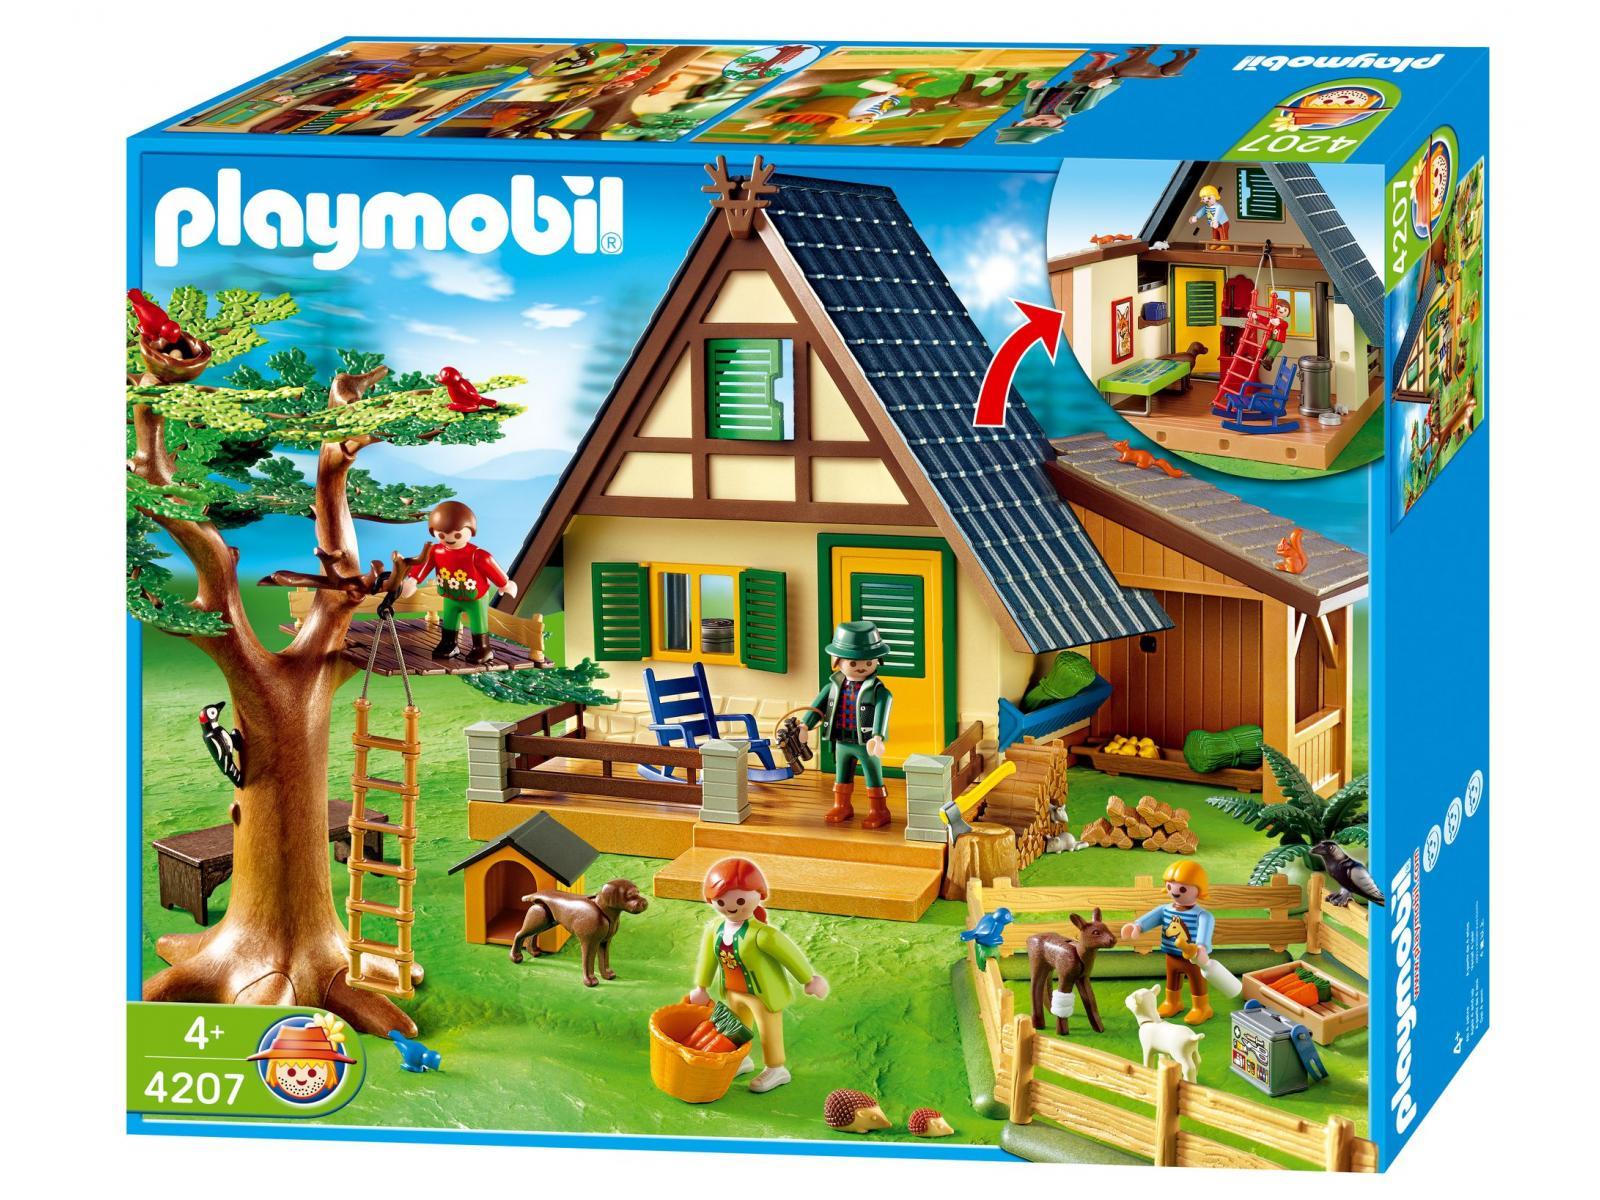 Maison ferme playmobil